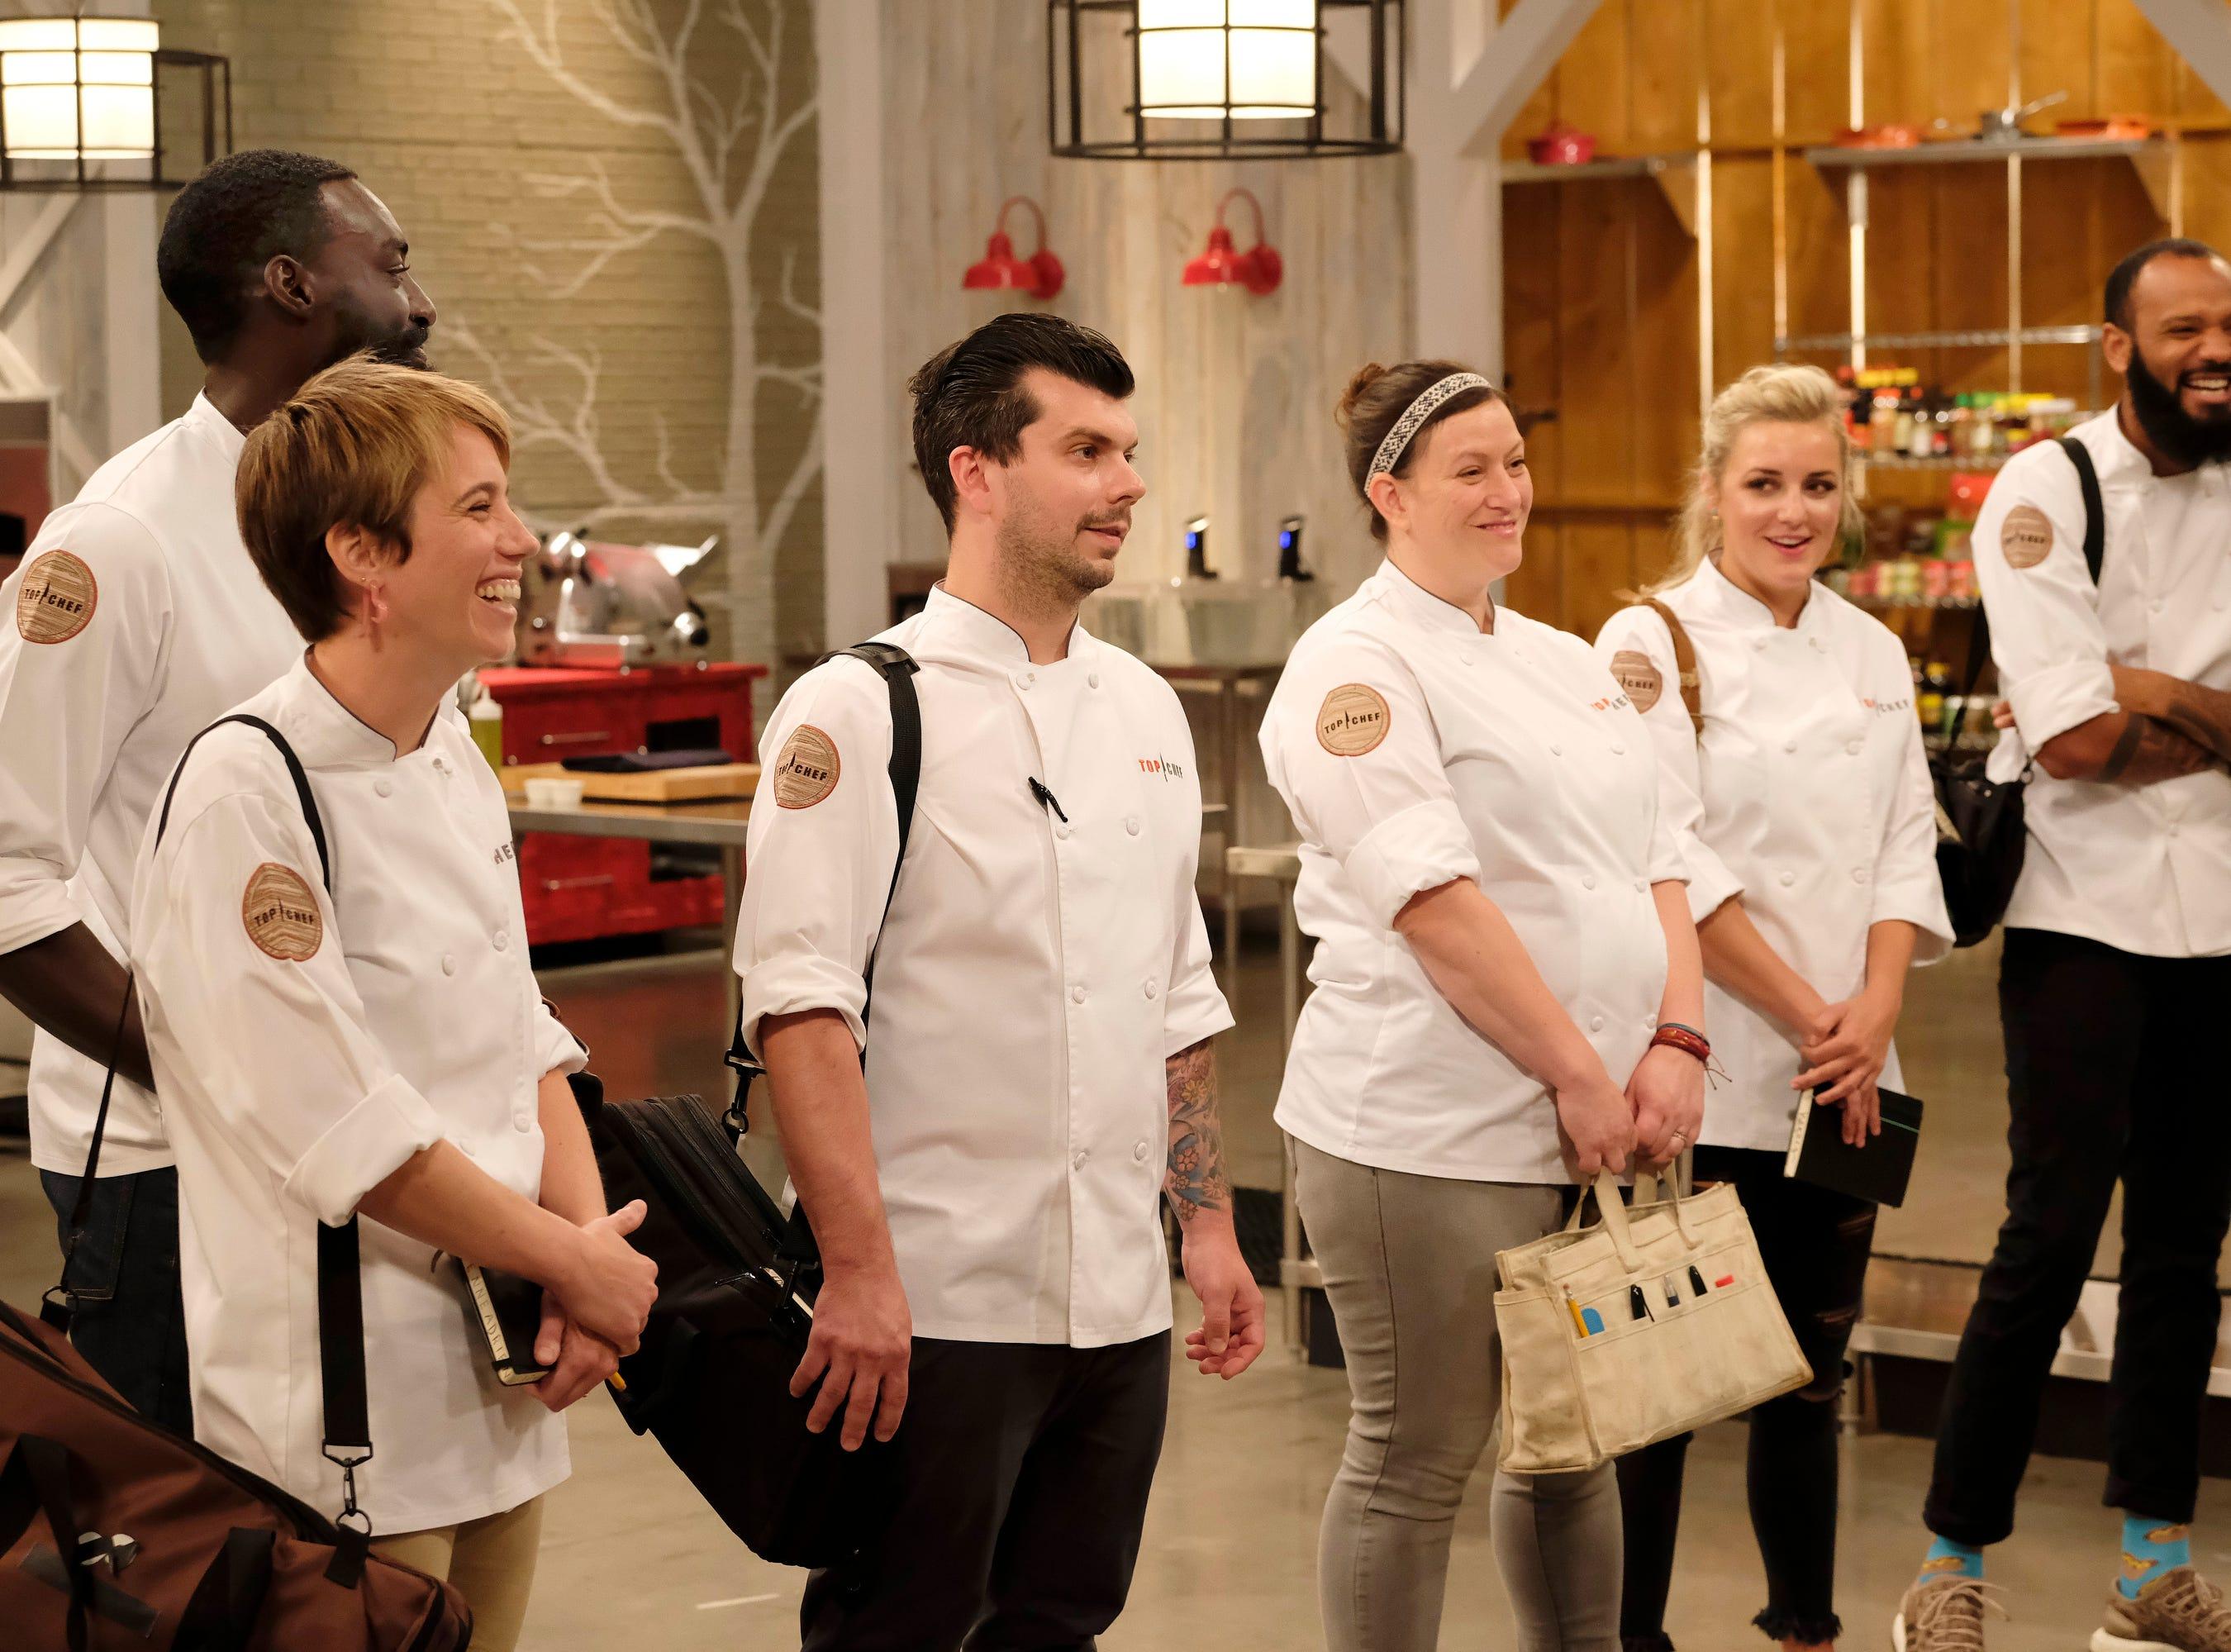 (From left to right): Adrienne Wright, Eric Adjepong, Eddie Konrad, Sara Bradley, Kelsey Barnard and Justin Sutherland on episode 11 of Bravo's 'Top Chef:' Kentucky season.